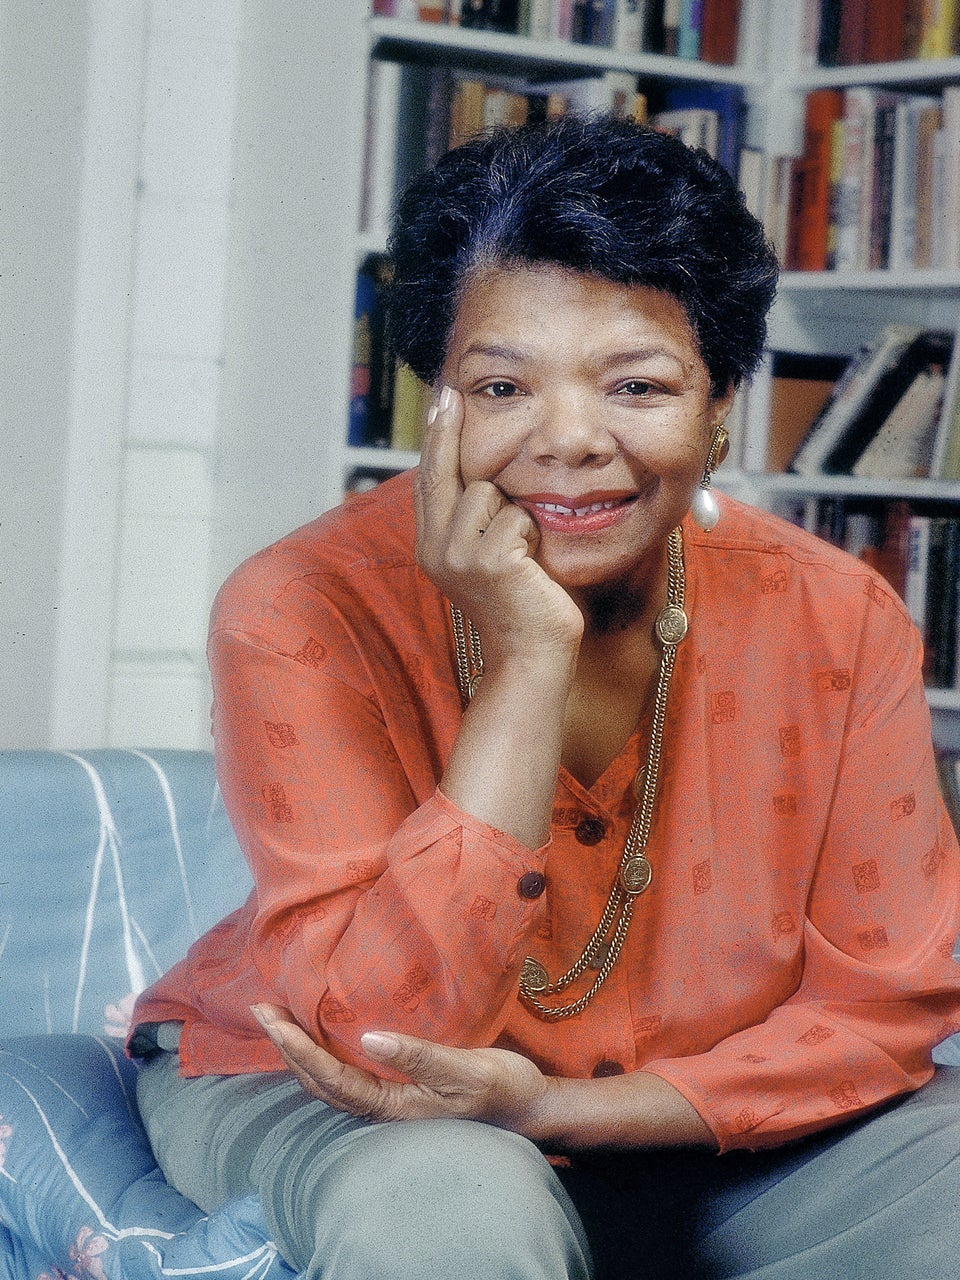 Coffee Talk: Maya Angelou's Estate Releases Posthumous Album of Her Poetry